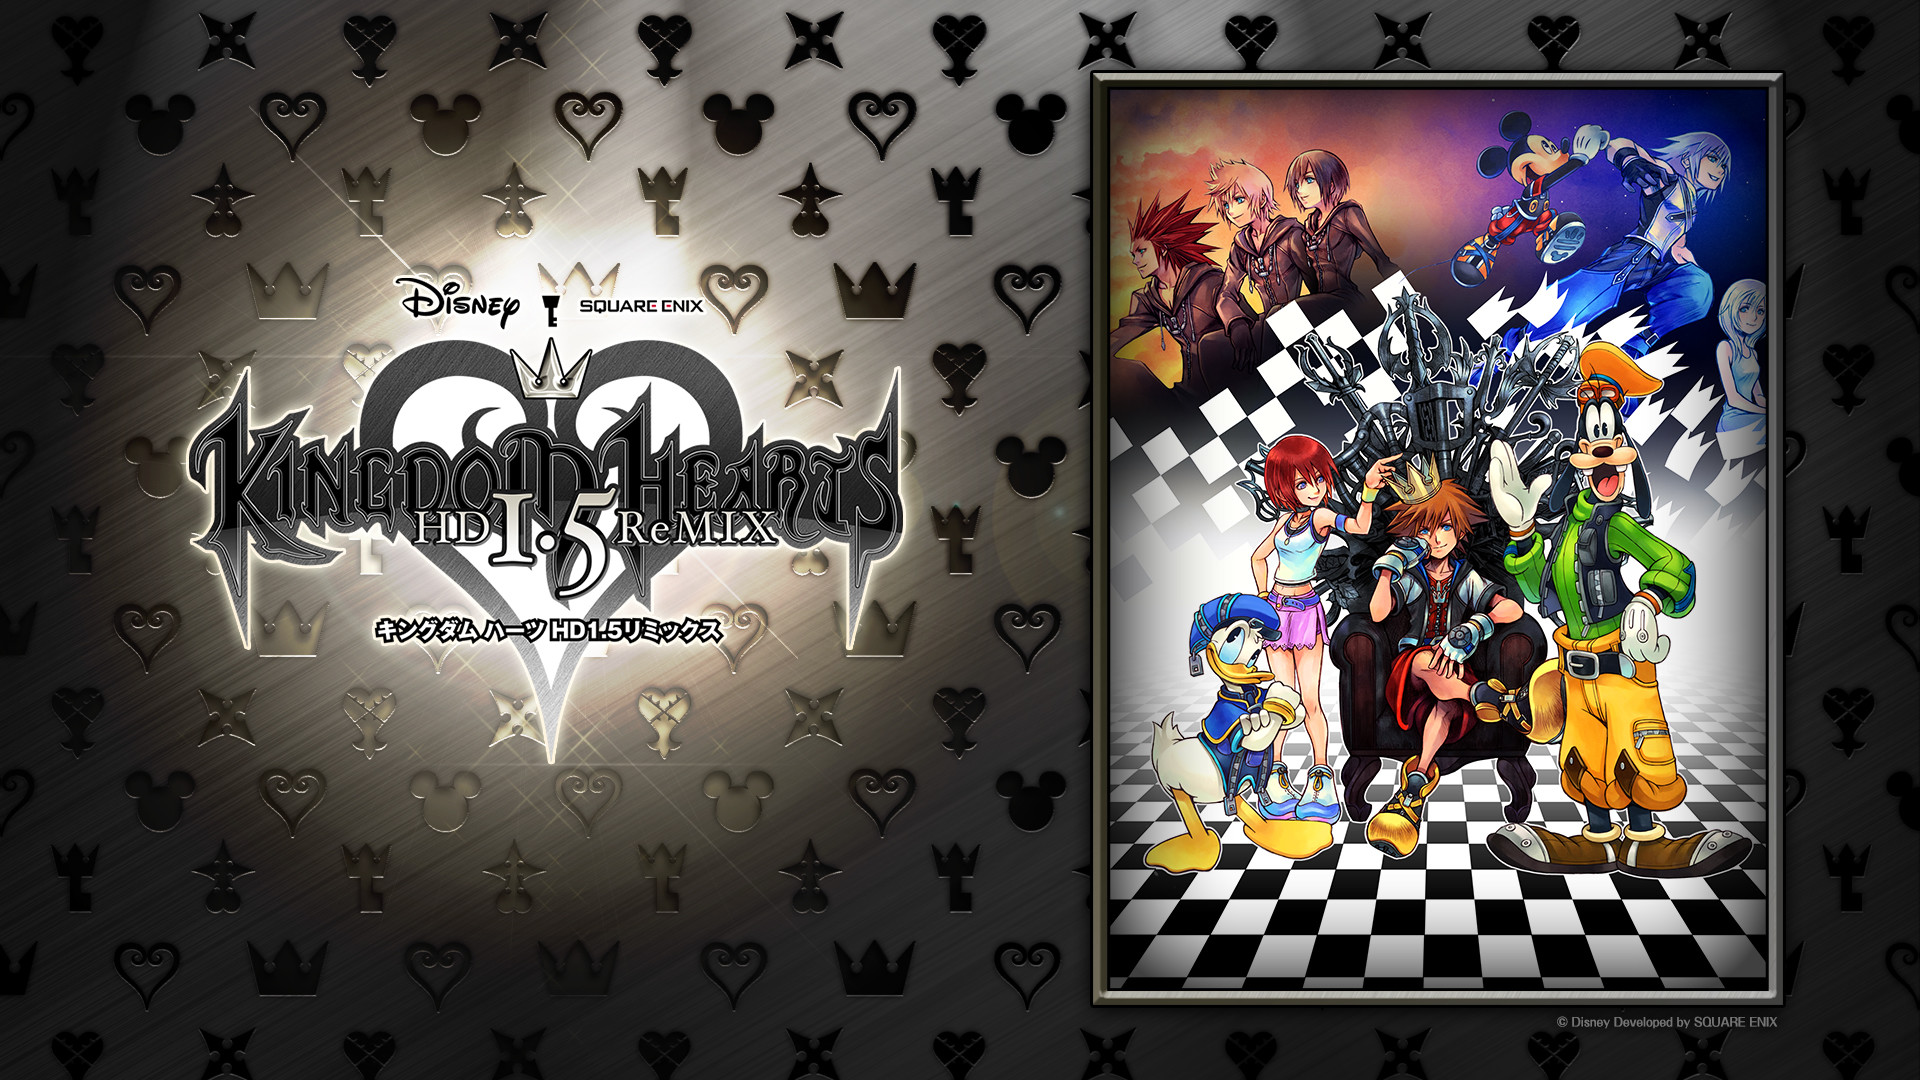 Oficial wallpaper Kingdom Hearts HD I.5 ReMIX Sora, Kairi, Riku, Donal,  Goofy, Mickey, Namine, Xion, Roxas and Axel | Kingdom Hearts HD I.5 ReMIX  …